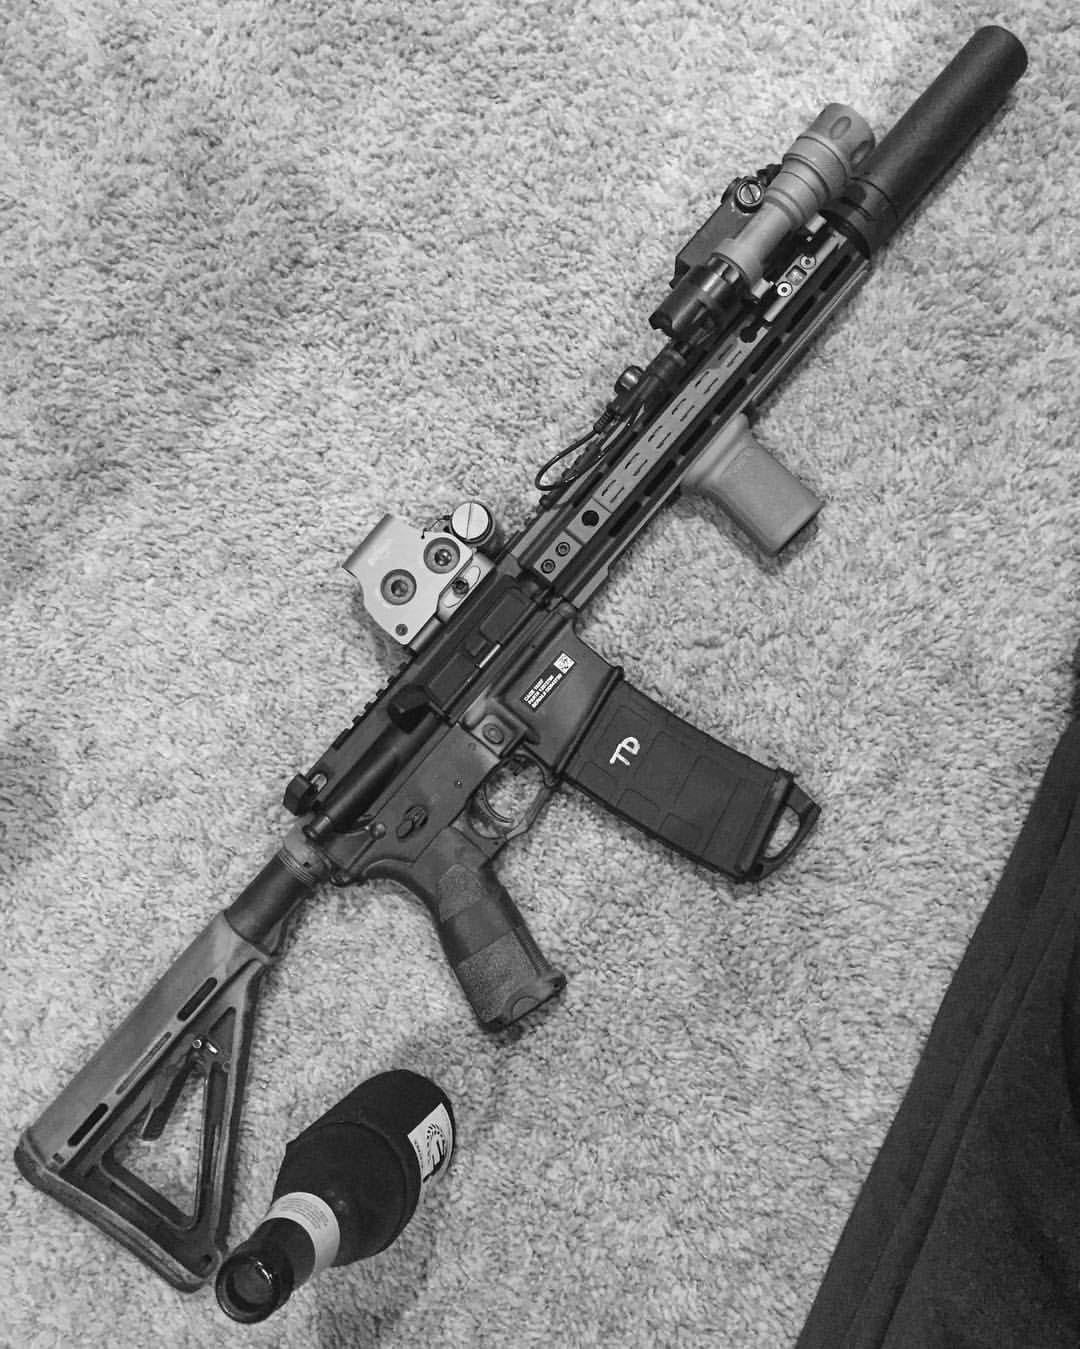 So hot right now. - - - - #ar15 #556 #bestgunsdaily #weaponsfanatics #sickgunsallday #firearmsdaily #weaponsdaily #weaponsreloaded #class3 #nfa #taxstamp #stampcollector #firearmphotography #gunfanatics #gunspictures #daily_badass #gunsdaily #proud2protect #gunporn #gun #rifleholics #nikon_photography_ #hotbrass365 #10point3inchmasterrace